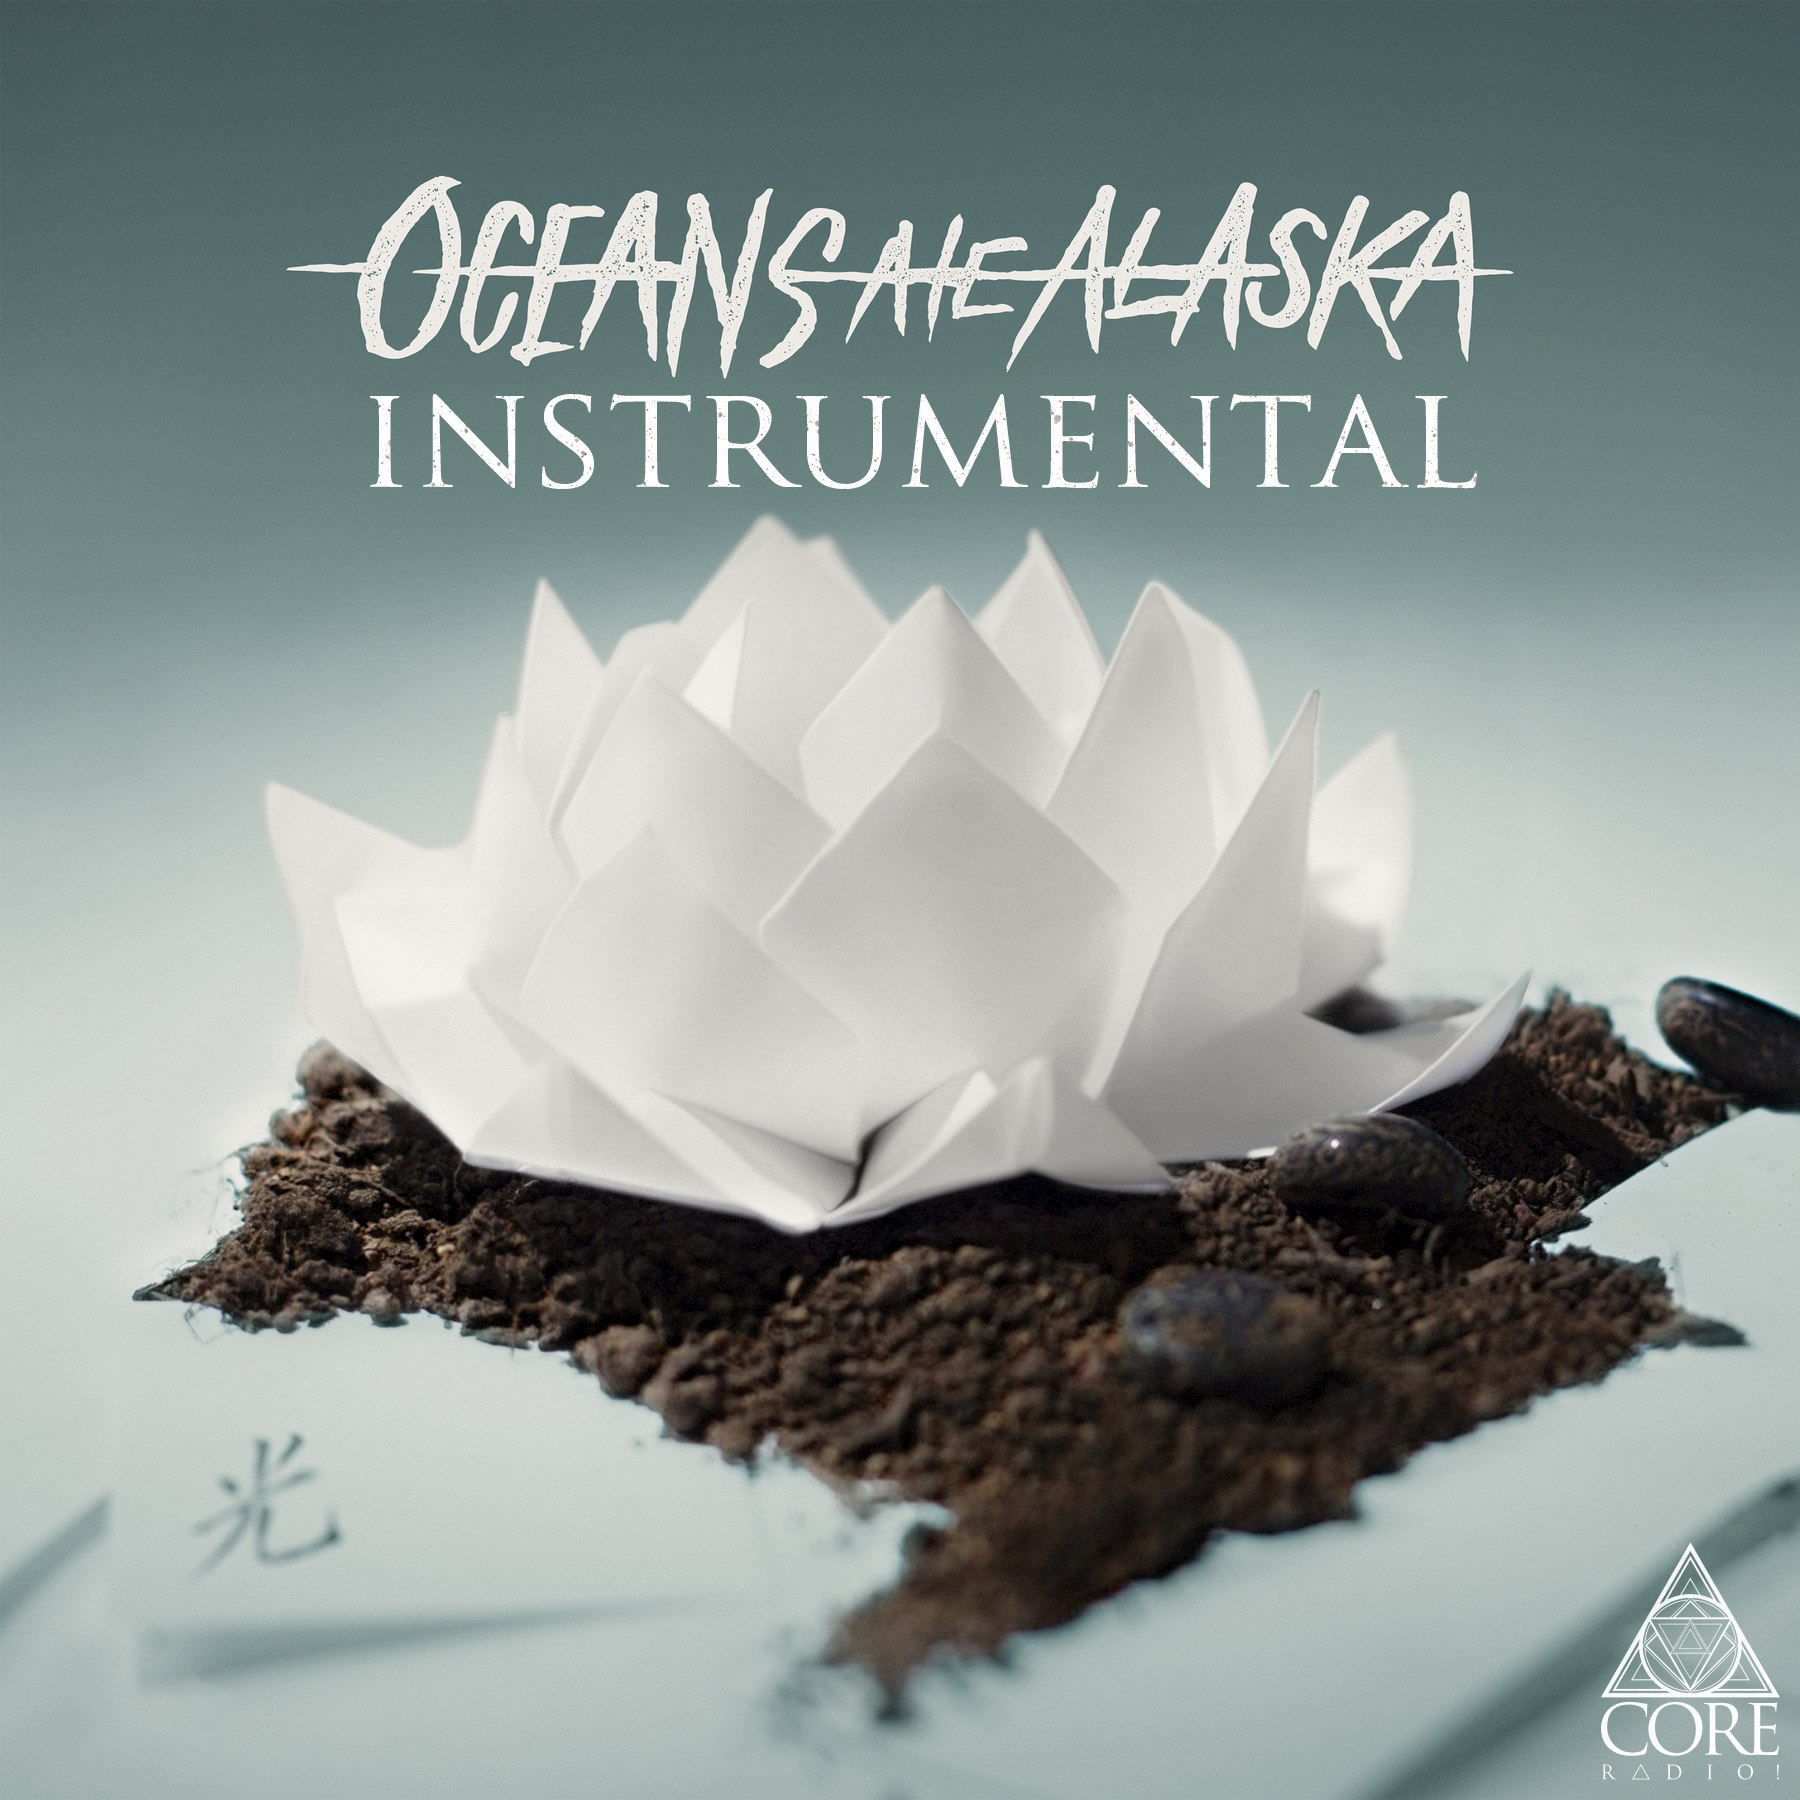 Oceans Ate Alaska - Hikari (Instrumental) (2017)